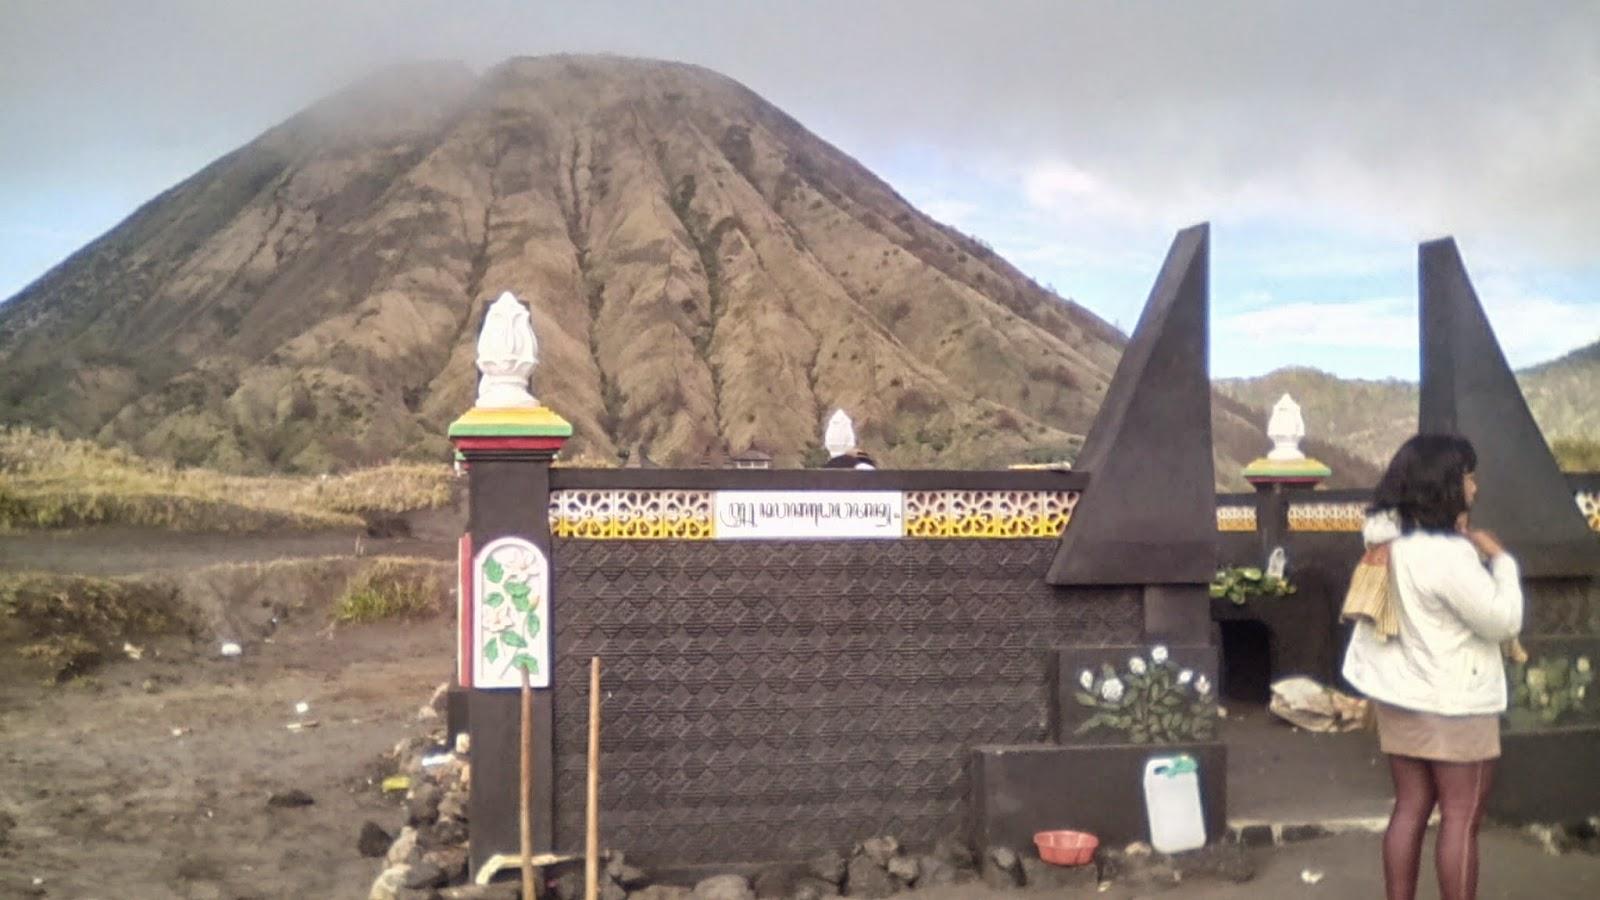 Lokasi Watu Dukun dengan latar belakang Gunung Batok